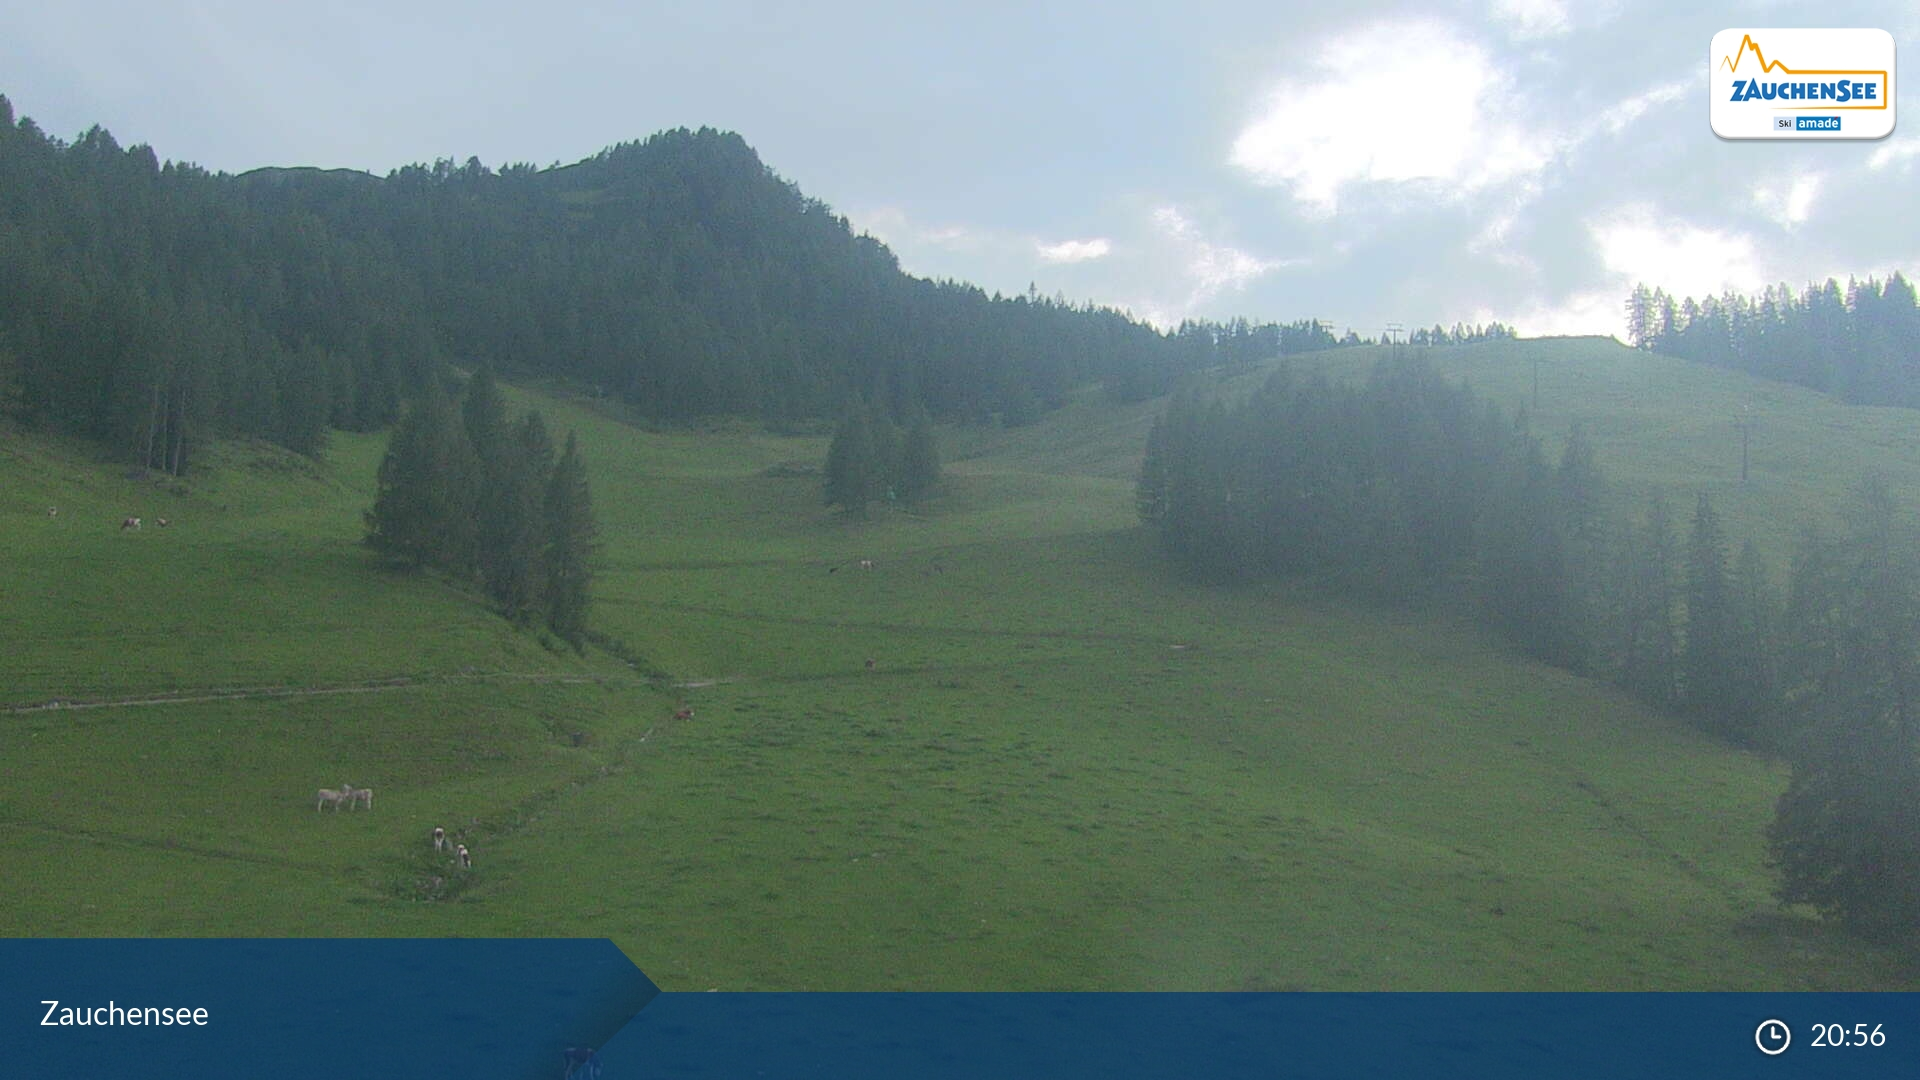 Webcam en Zauchensee - Weltcuparena, Flachau (Austria)